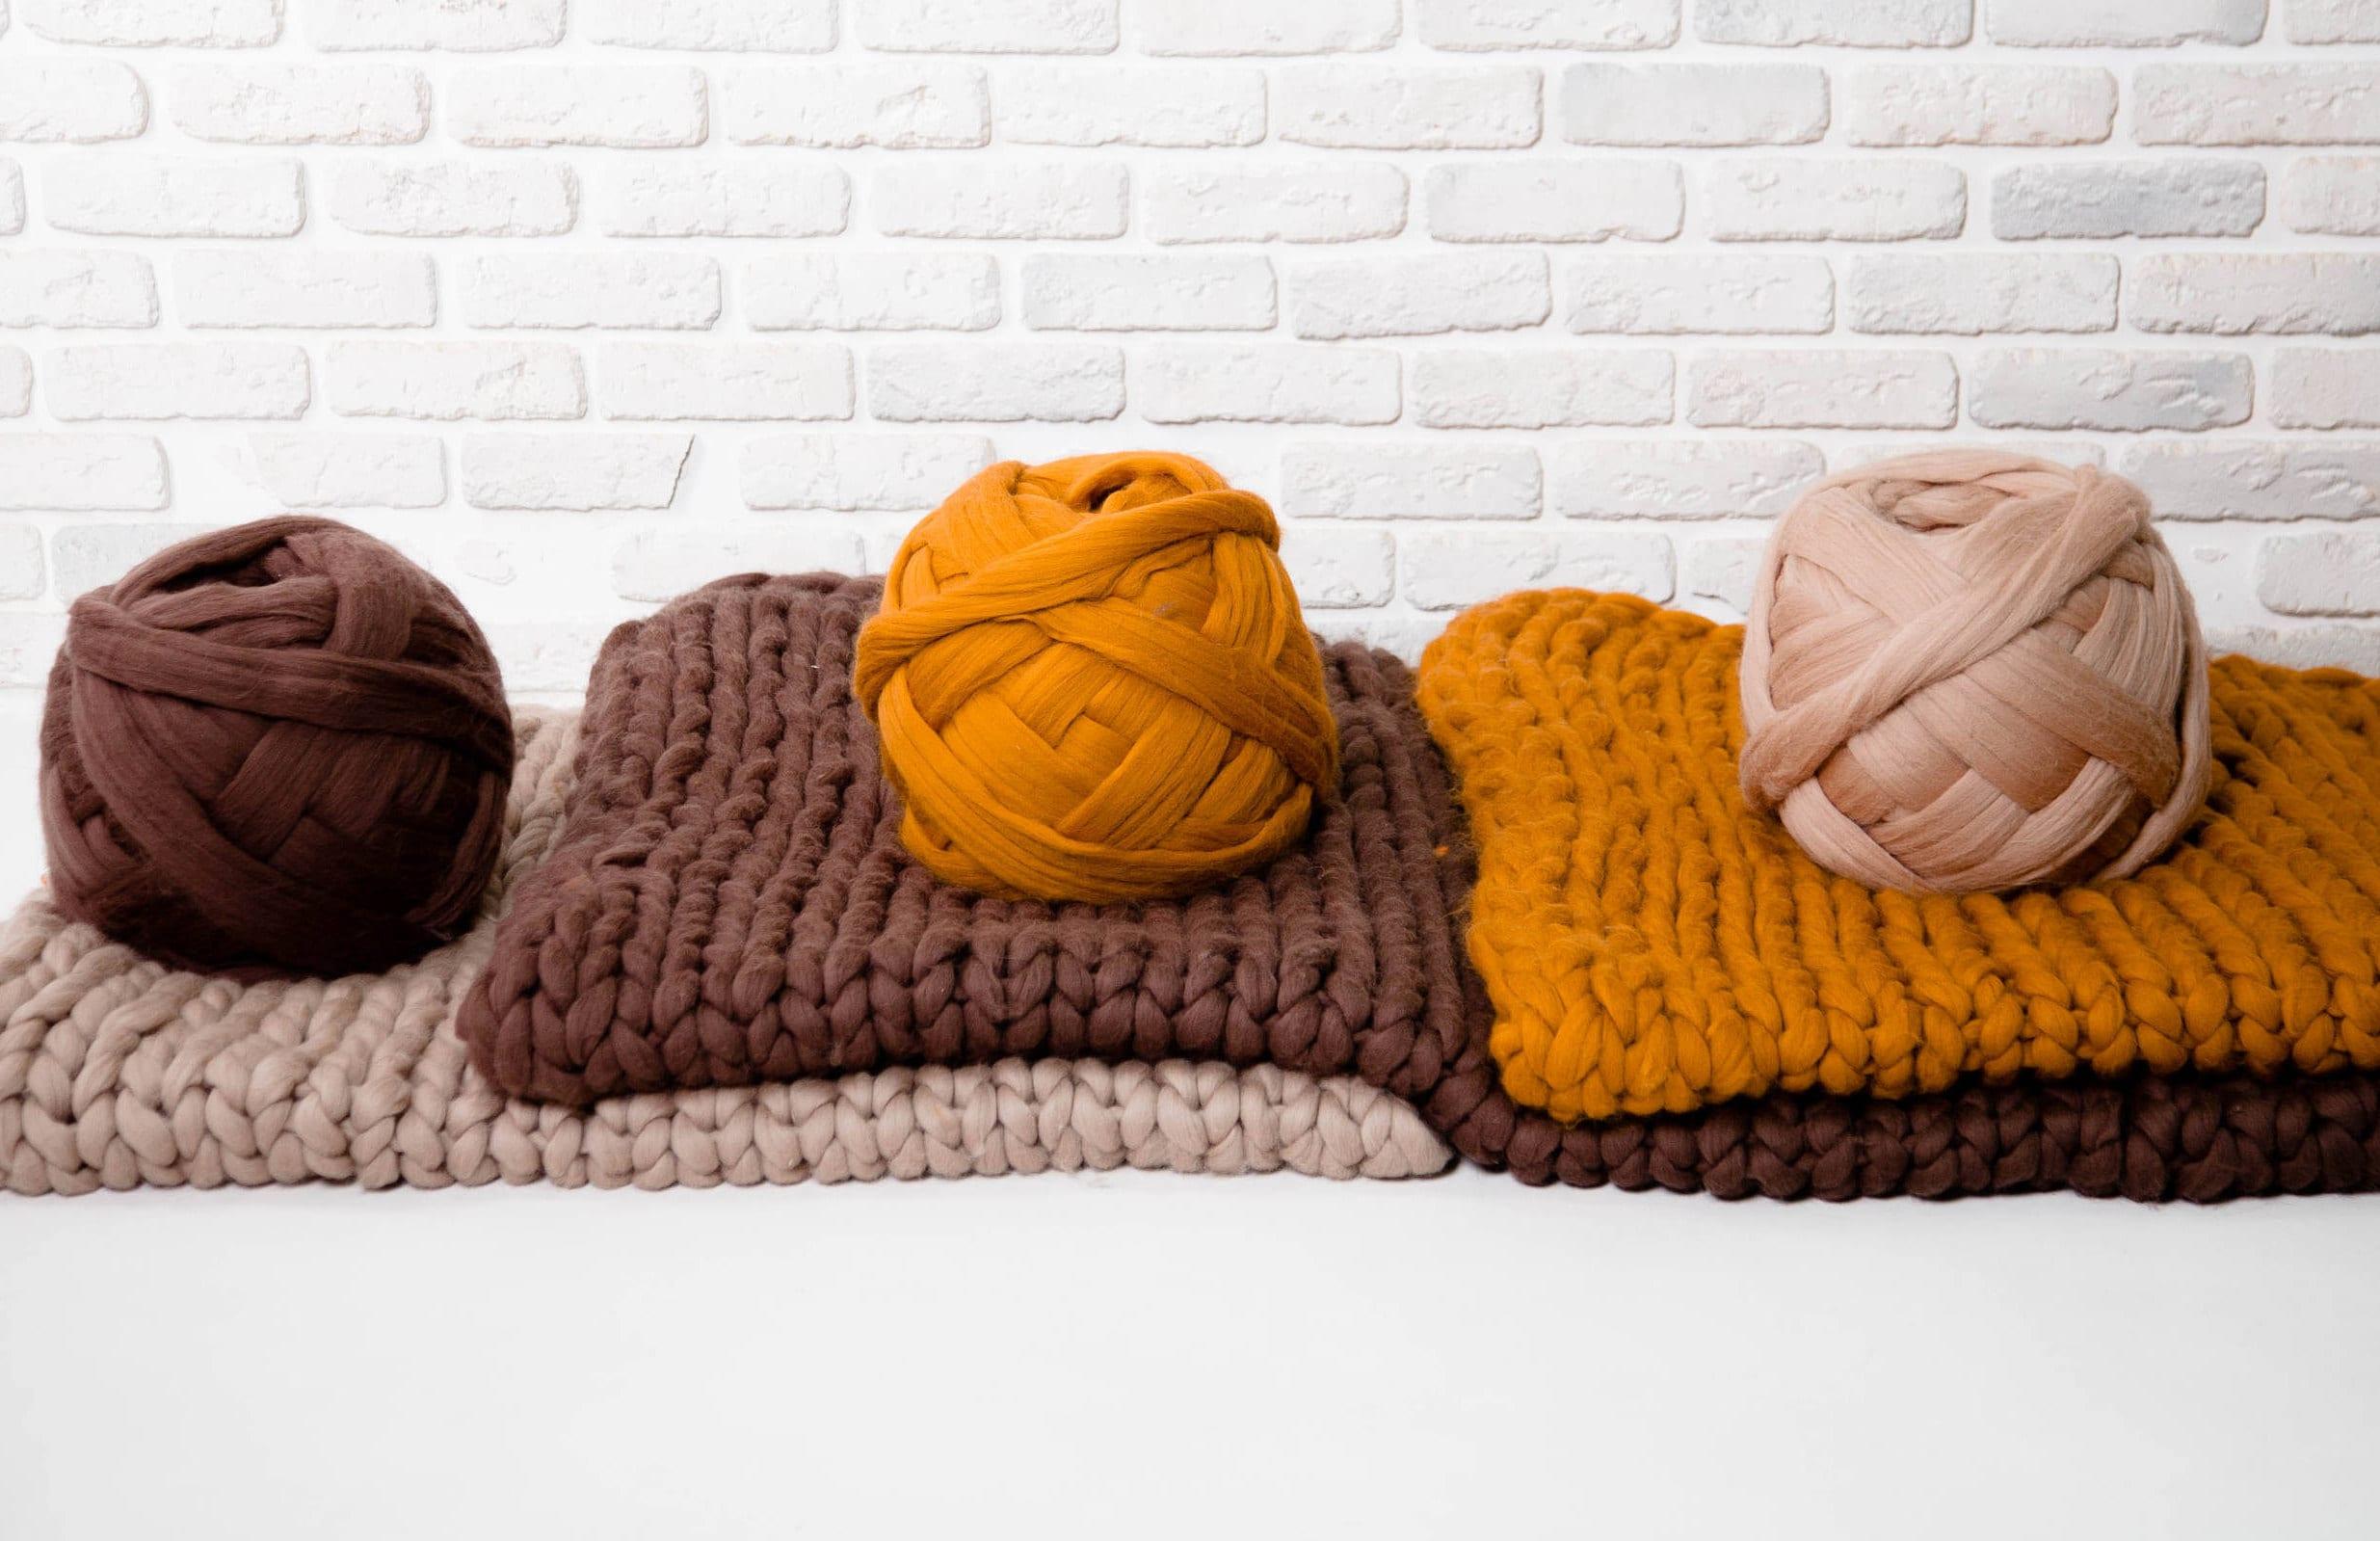 riesen wolle f r arm knitting bergro e garn mega sperriges. Black Bedroom Furniture Sets. Home Design Ideas